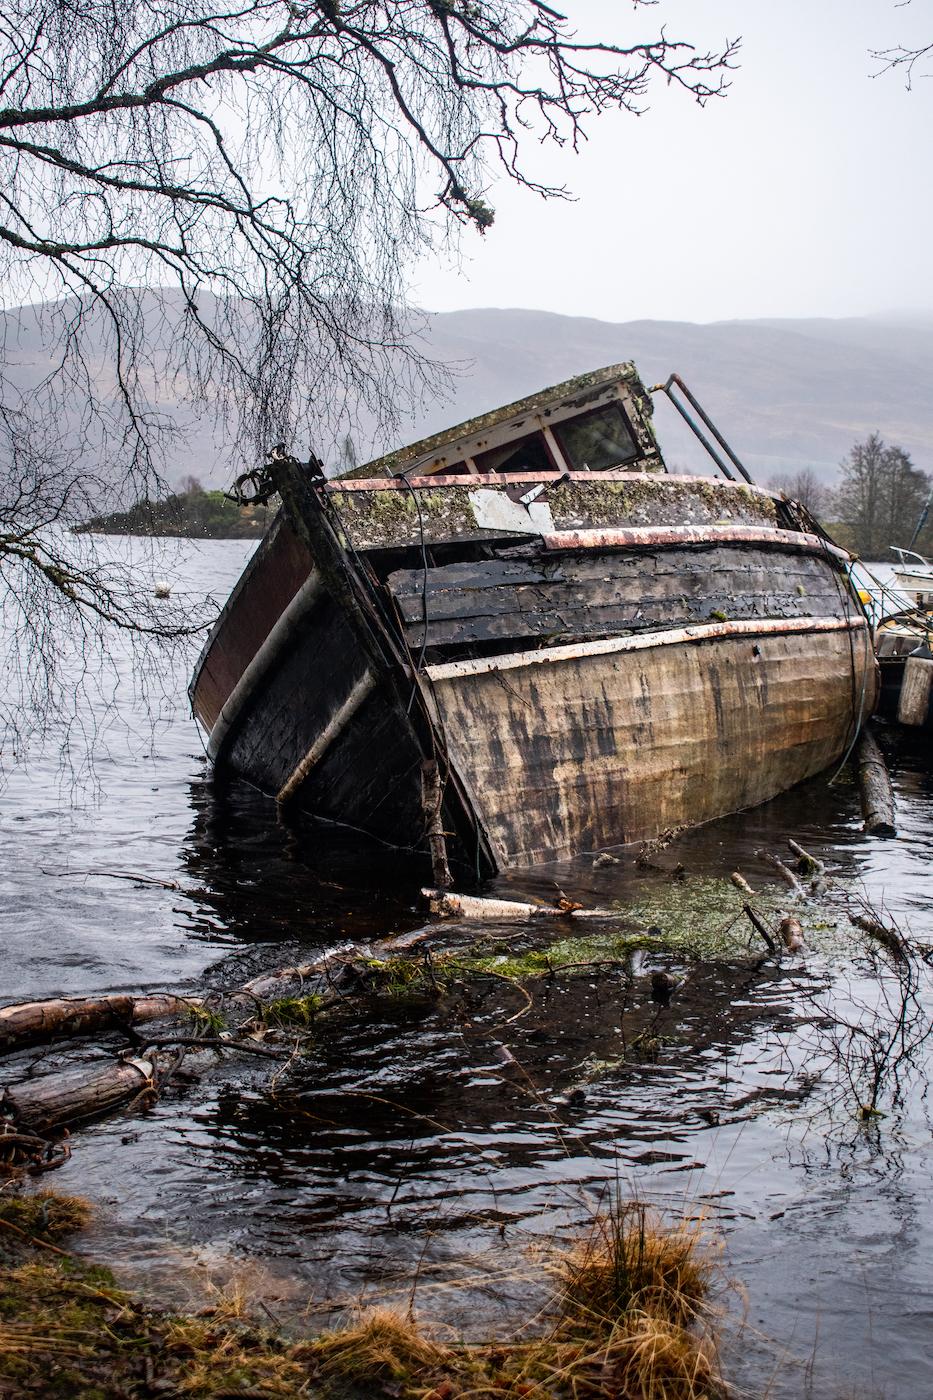 Abandoned Boats, Loch Ness, United Kingdom